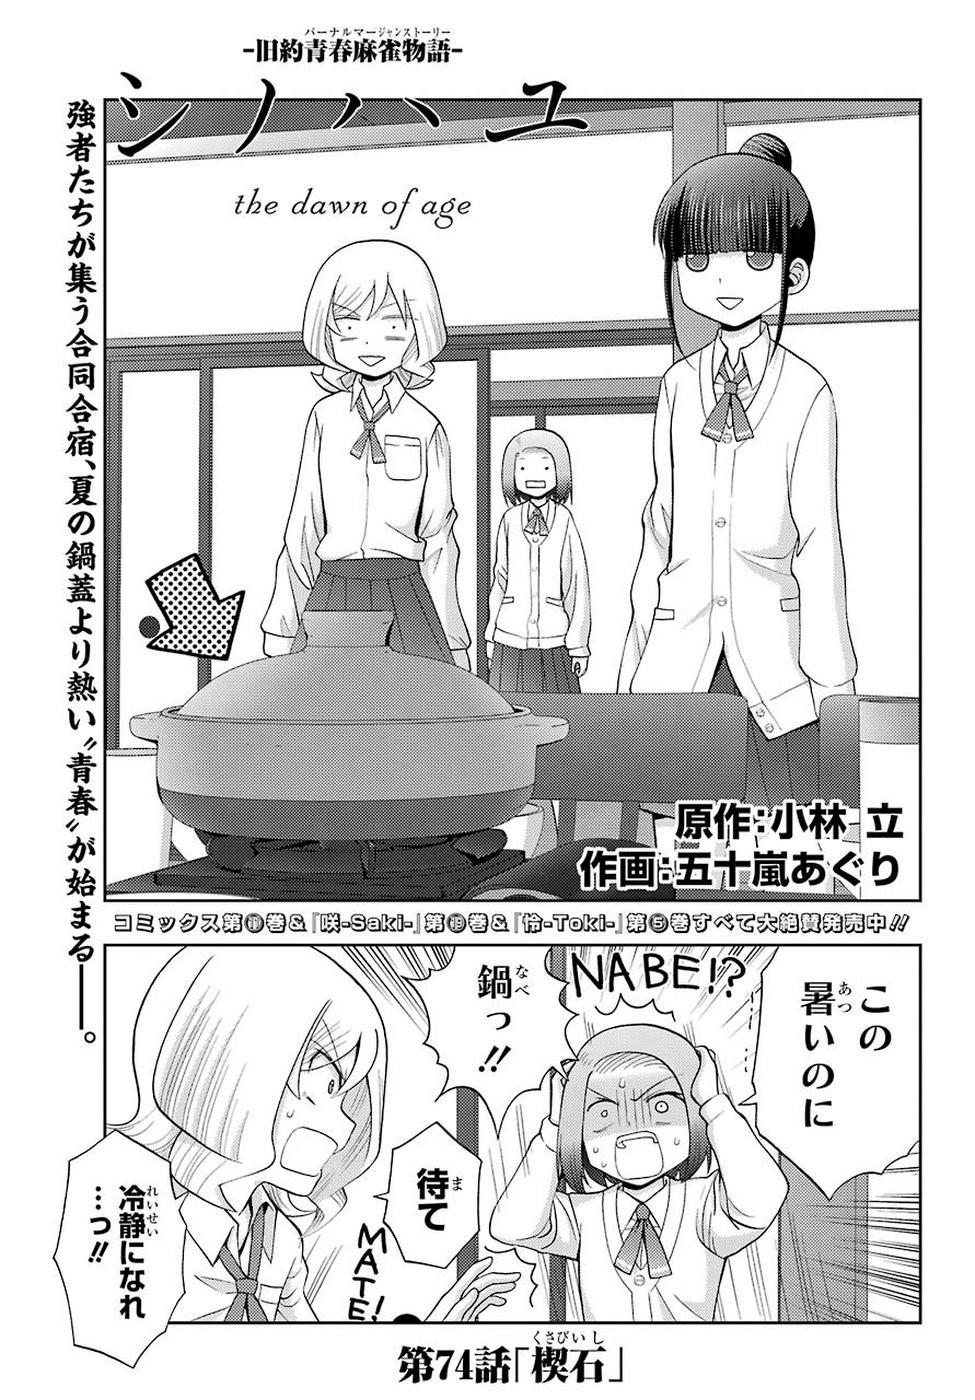 Shinohayu - The Dawn of Age Manga - Chapter 074 - Page 1